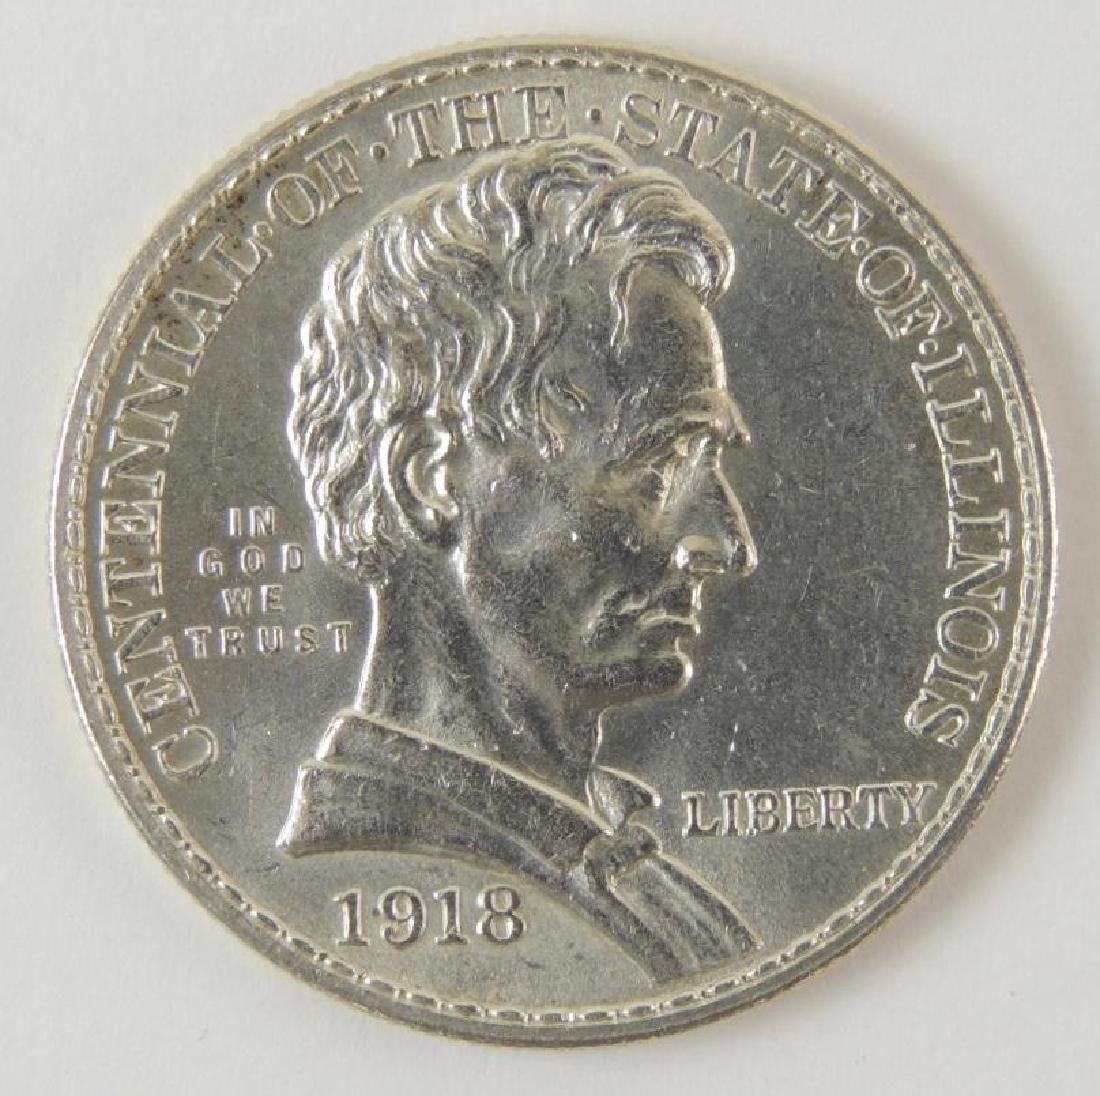 1918 Illinois Centennial Commemorative Half Dollar